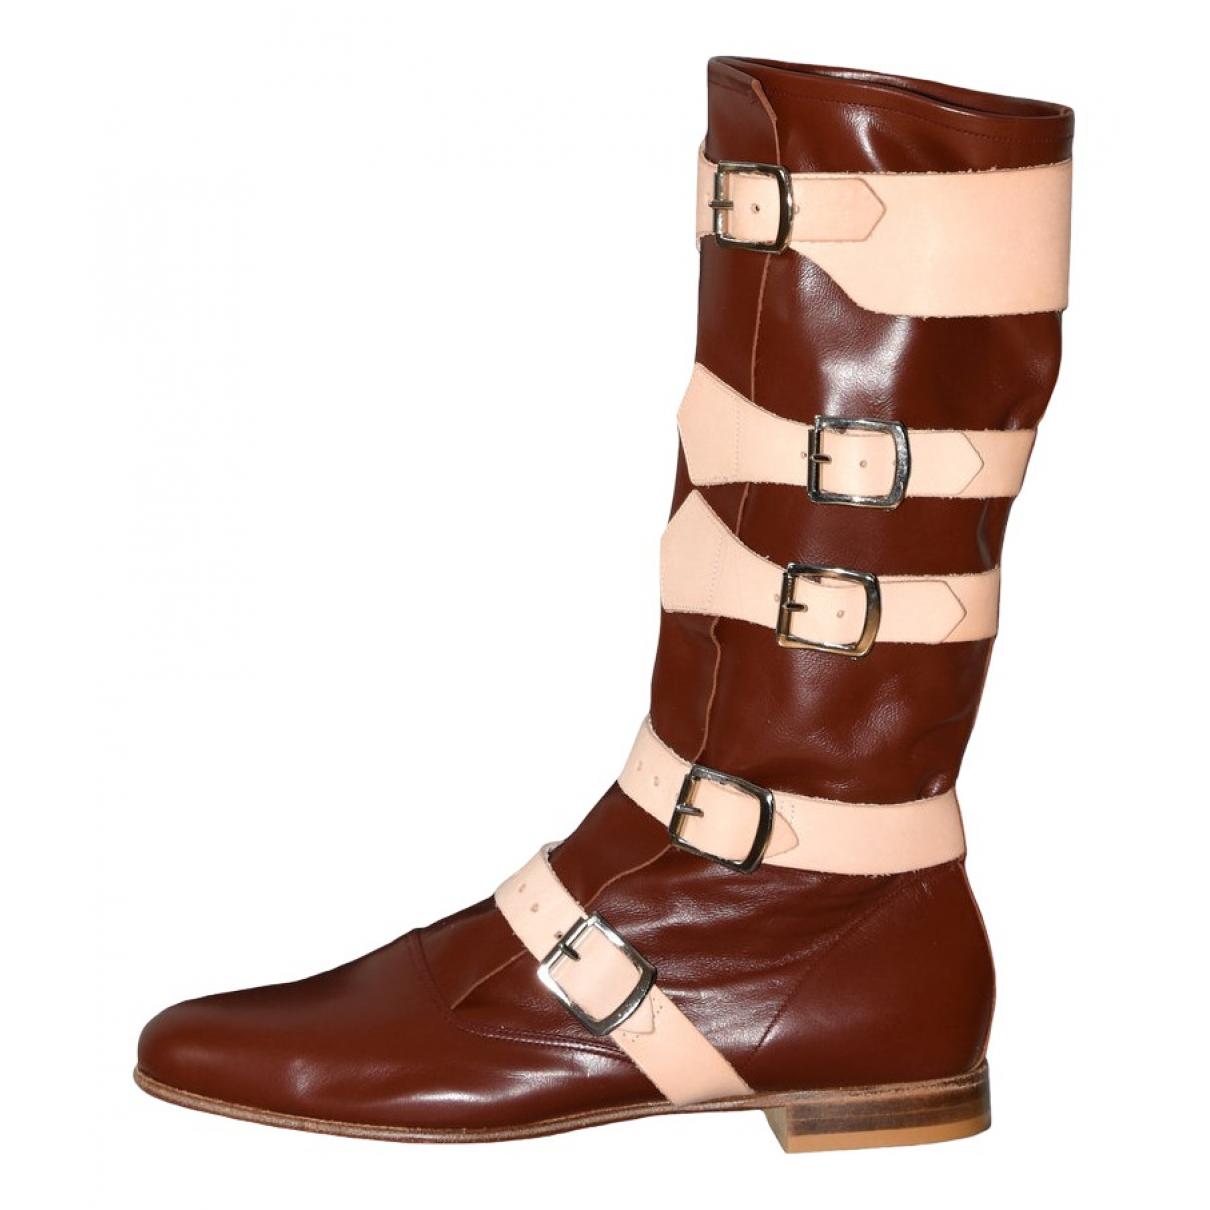 Vivienne Westwood N Brown Leather Boots for Men 41 EU